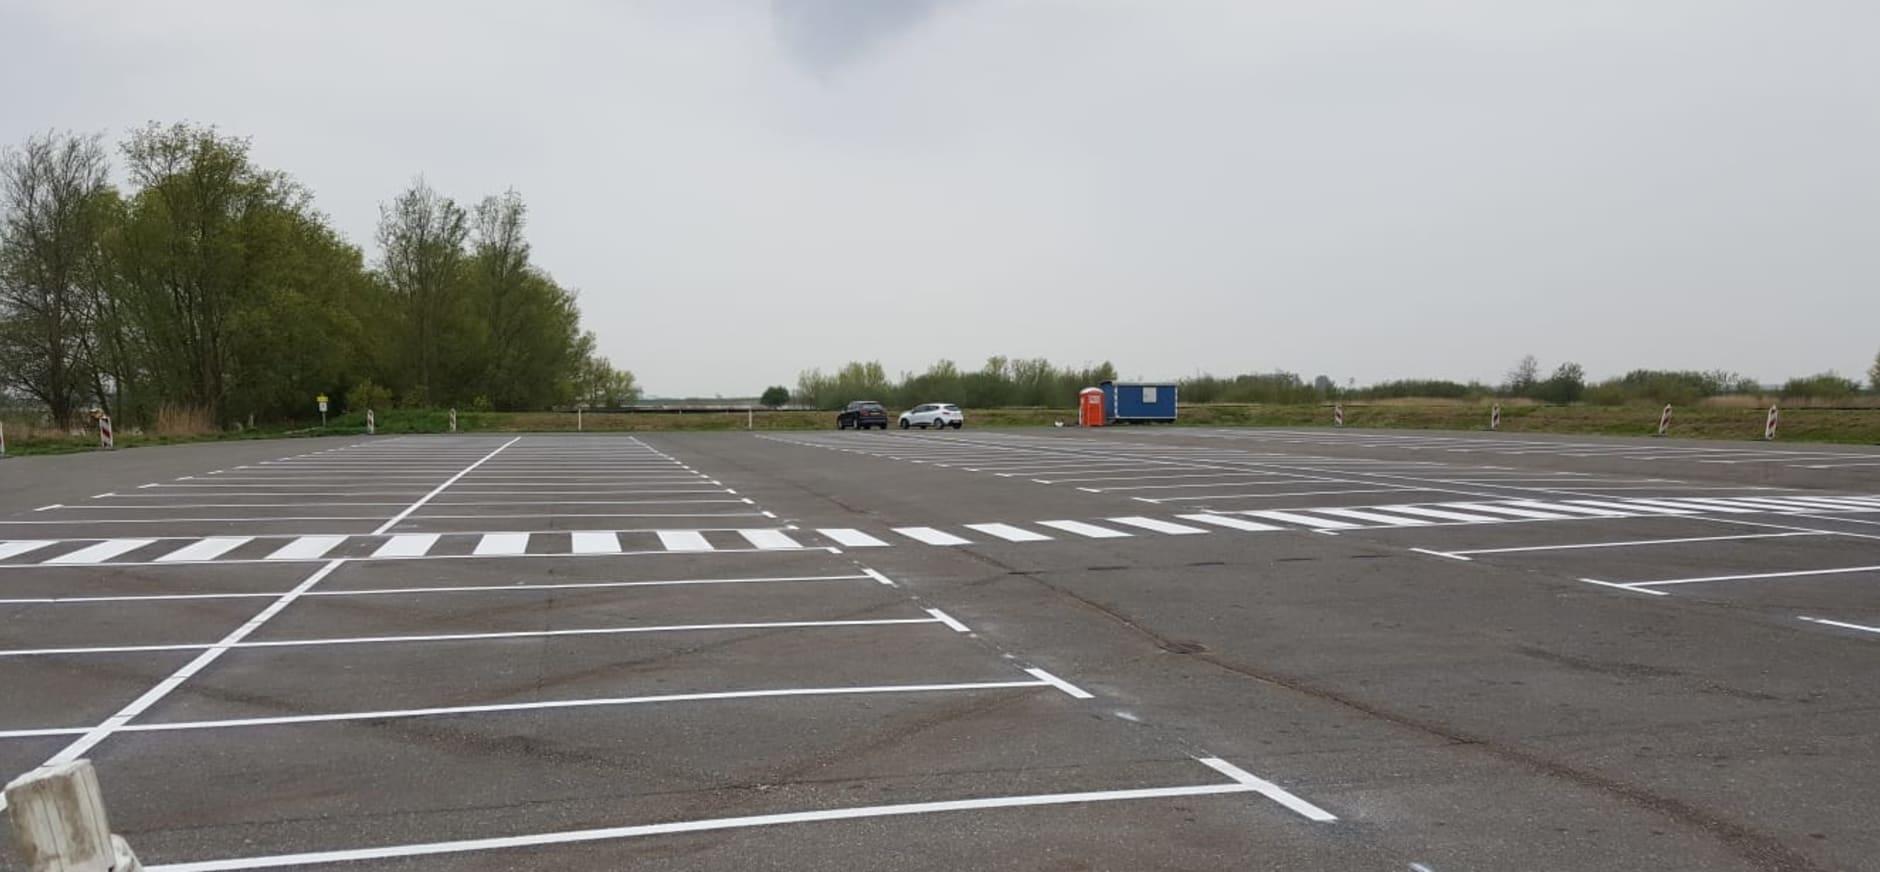 Werkzaamheden parkeerterrein Tiengemeten